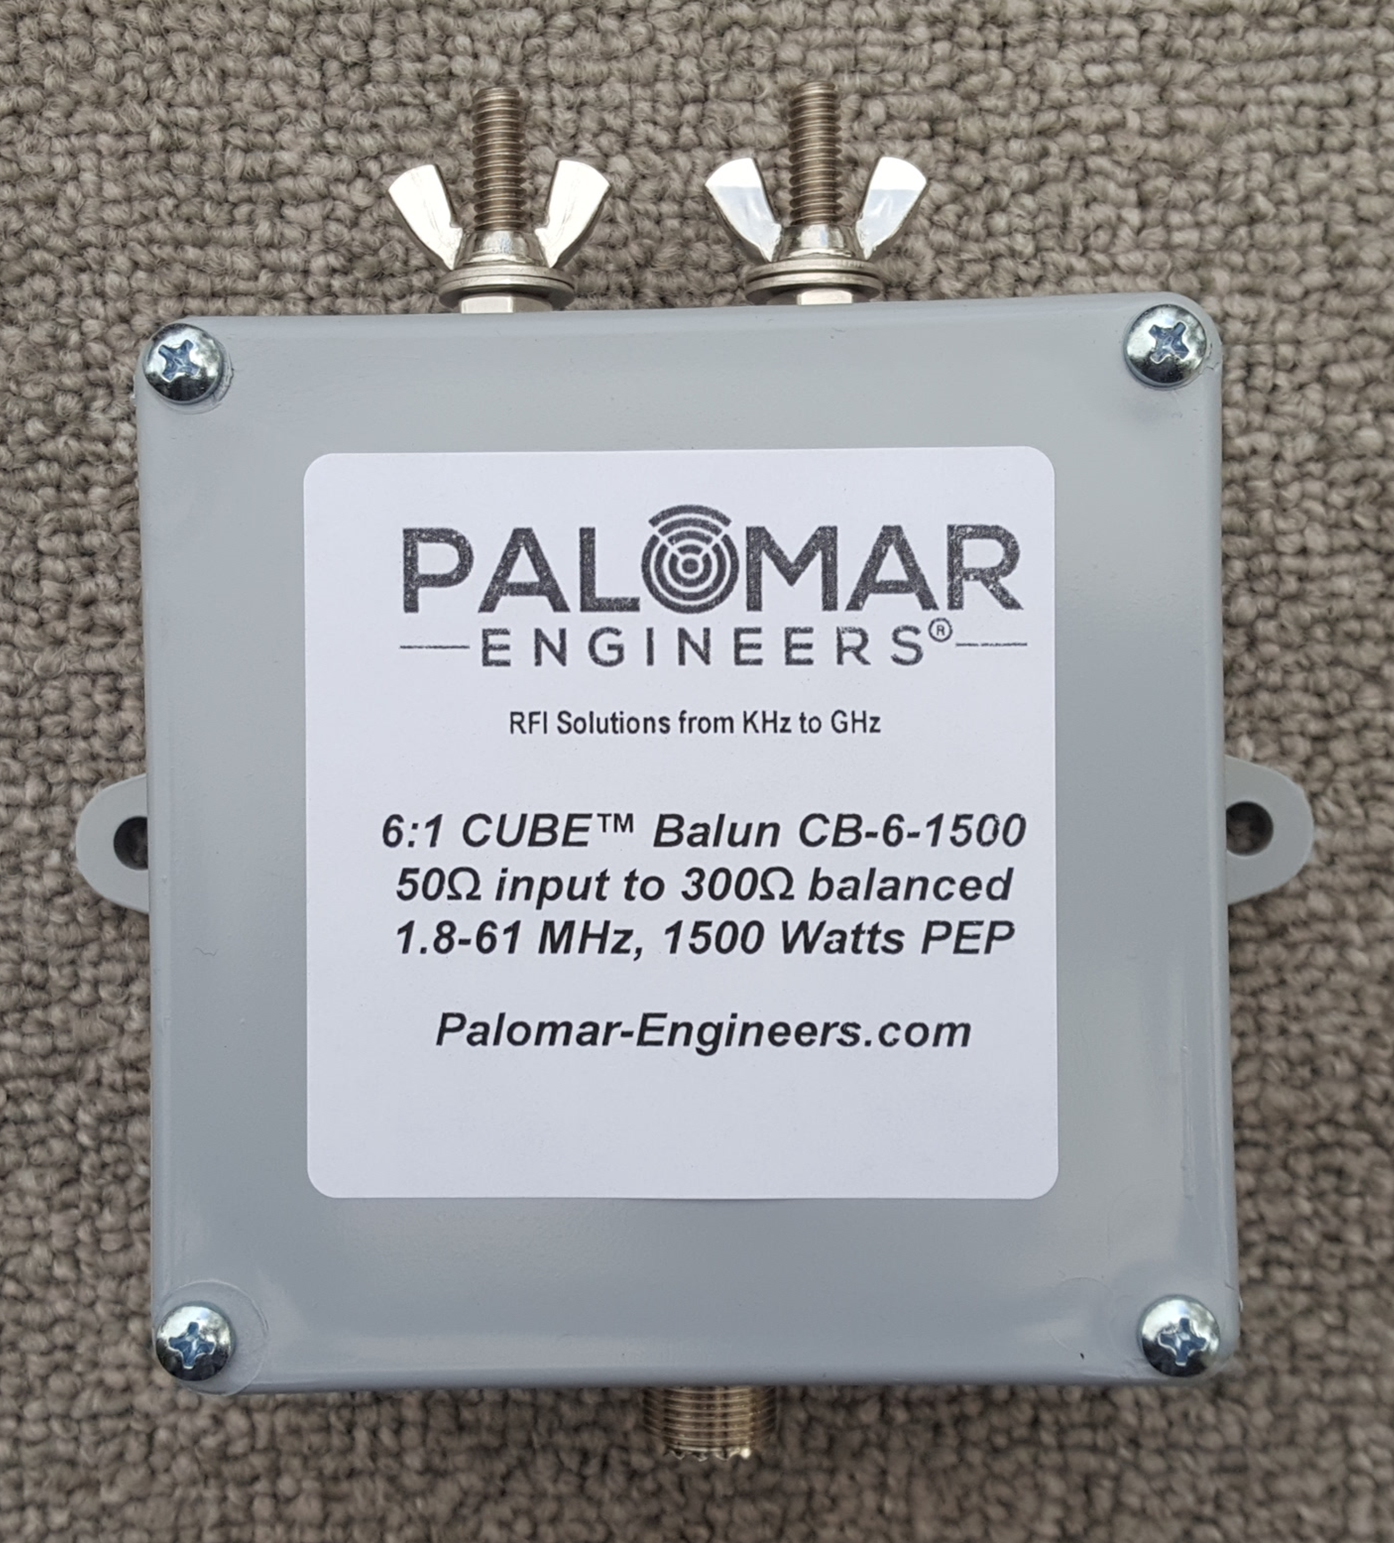 50:300 (6:1) CUBE™ Balun, 1-61 MHz, 1.5/3KW (choose top stud/eyebolt/power rating) CB-6-1500